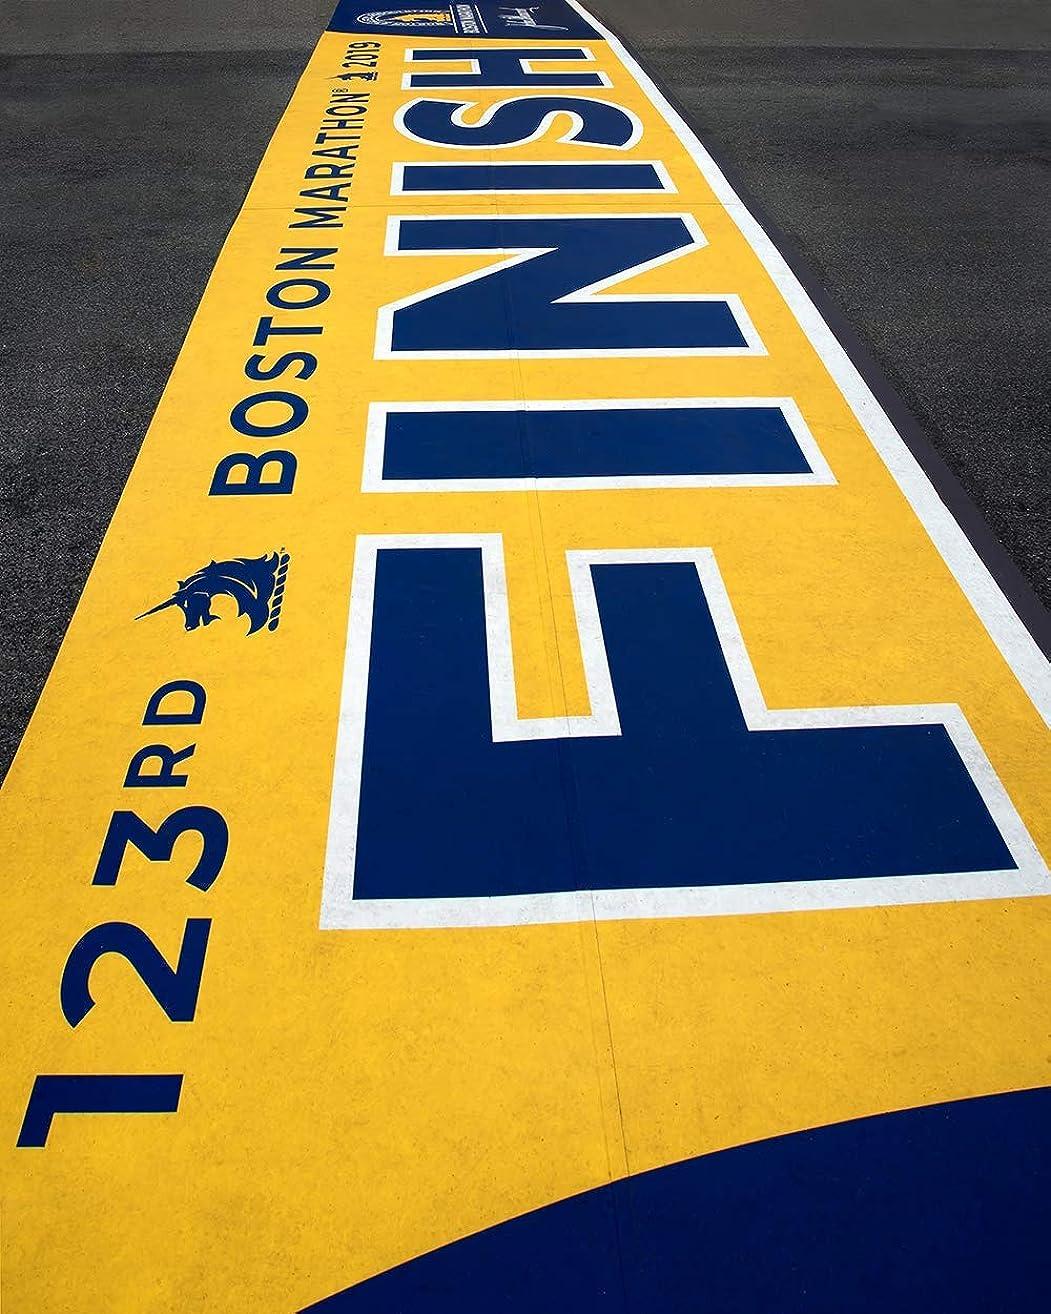 2019 Boston Marathon Finish Line, Marathon Finish Line, Gifts For Runners, Choose Print or Canvas